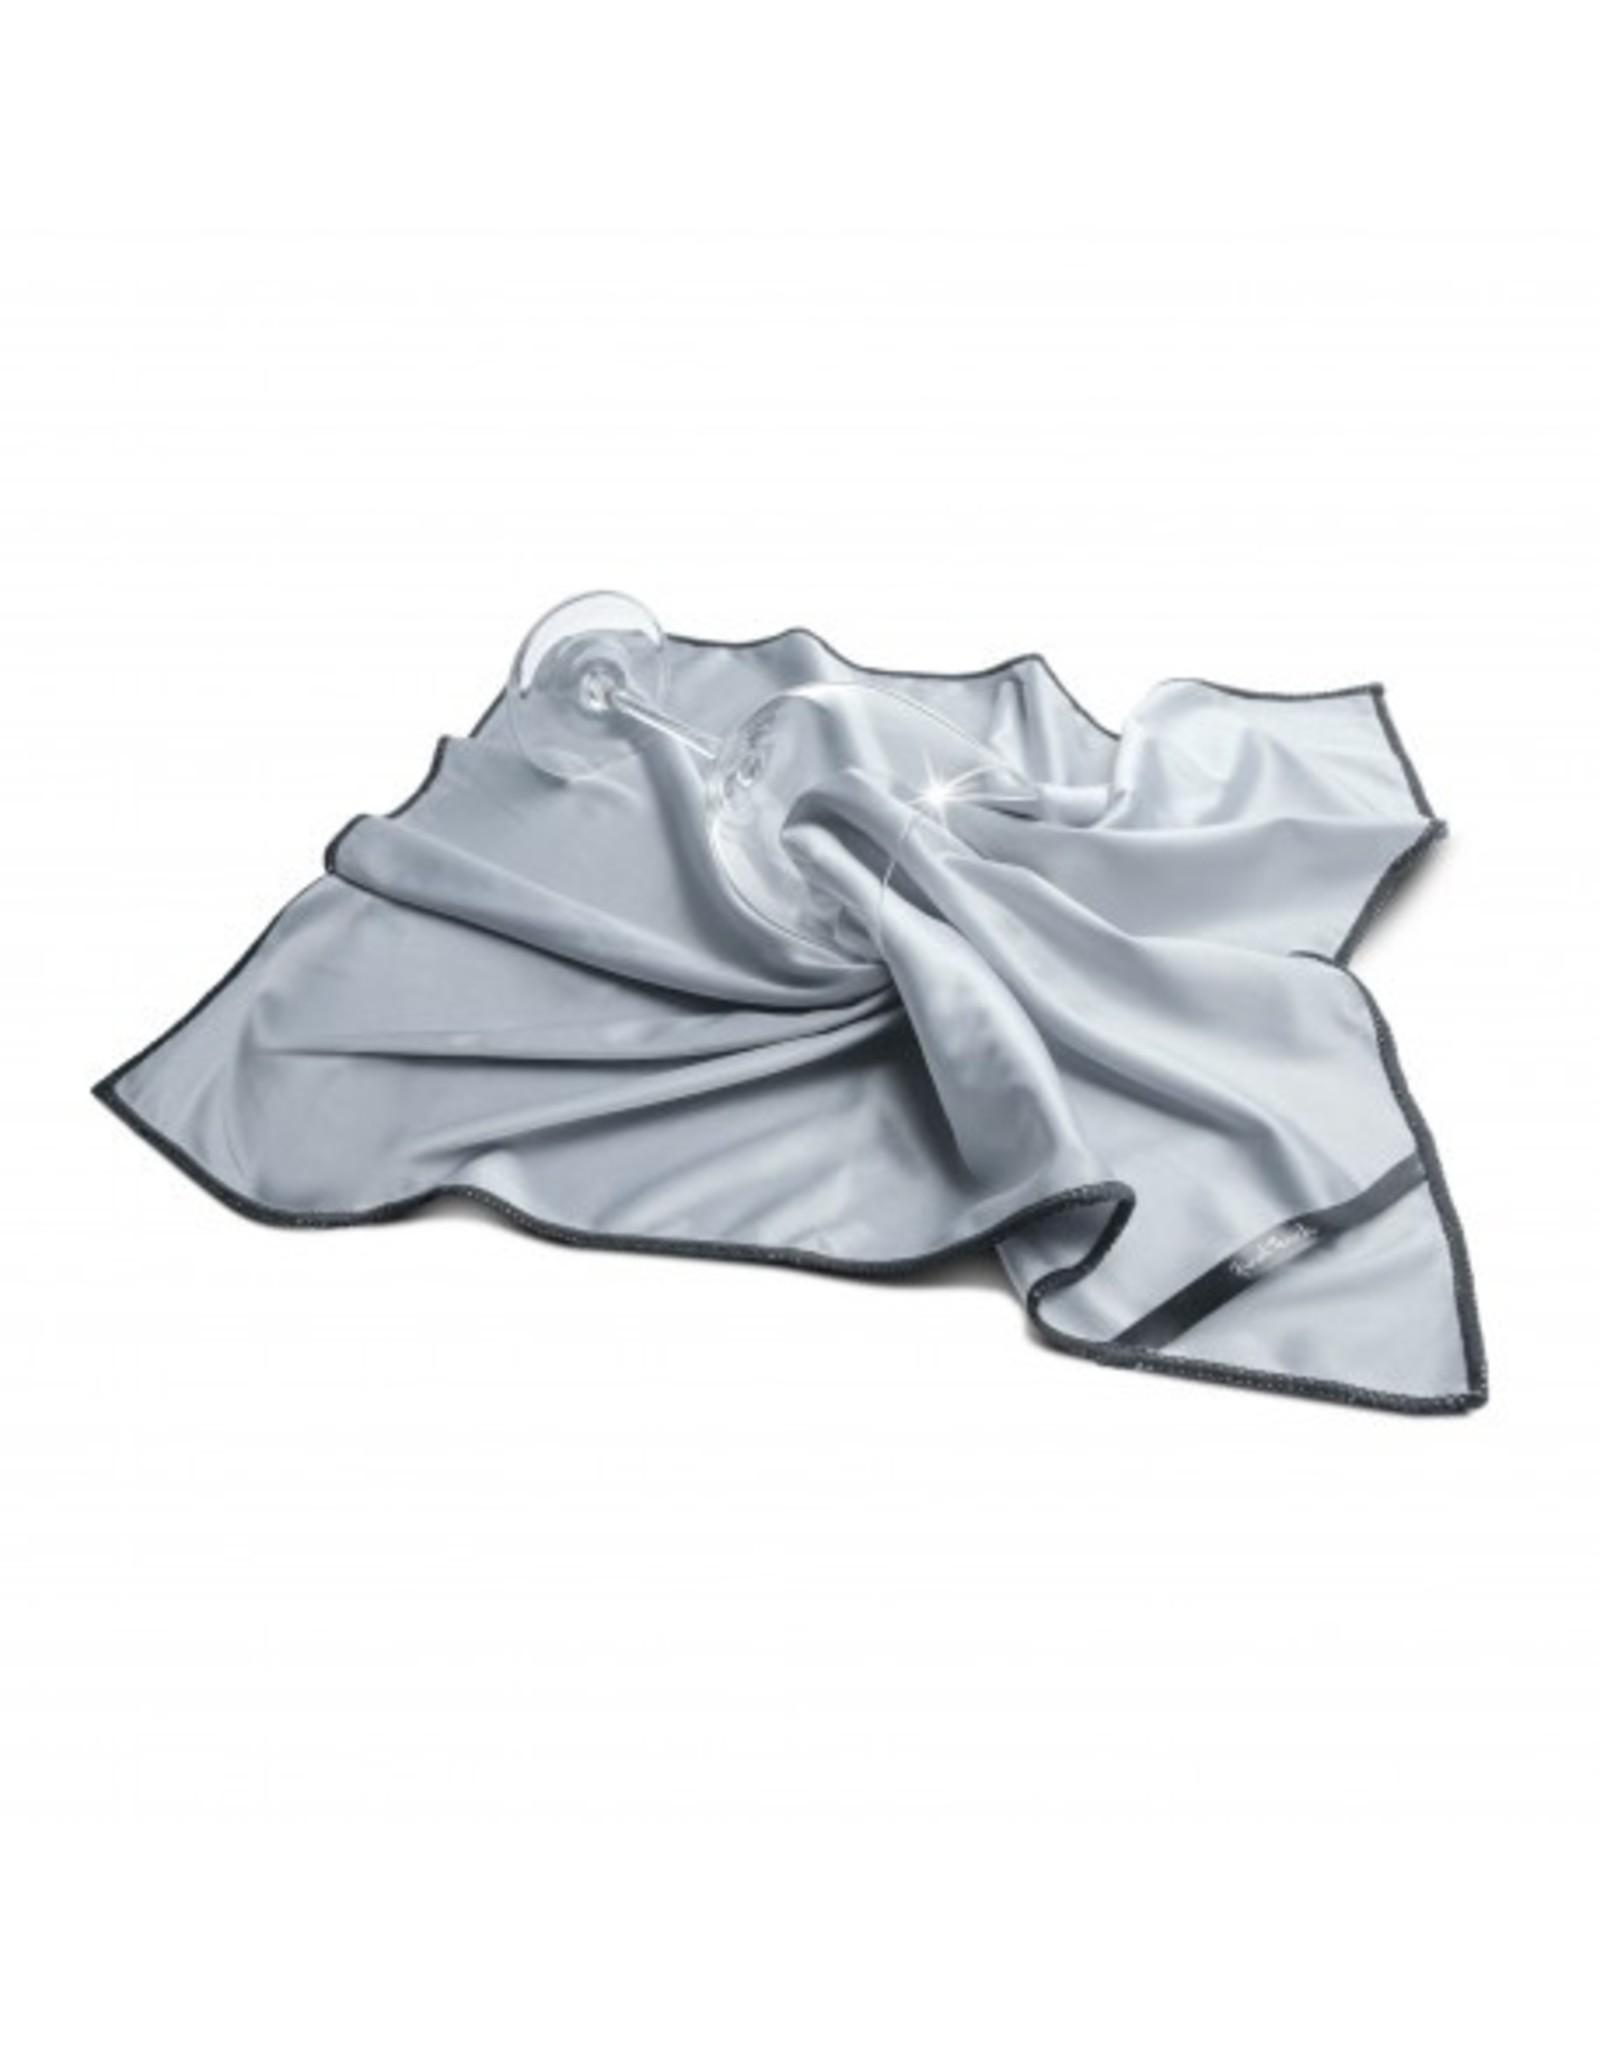 Glass Polishing Cloth- Carded